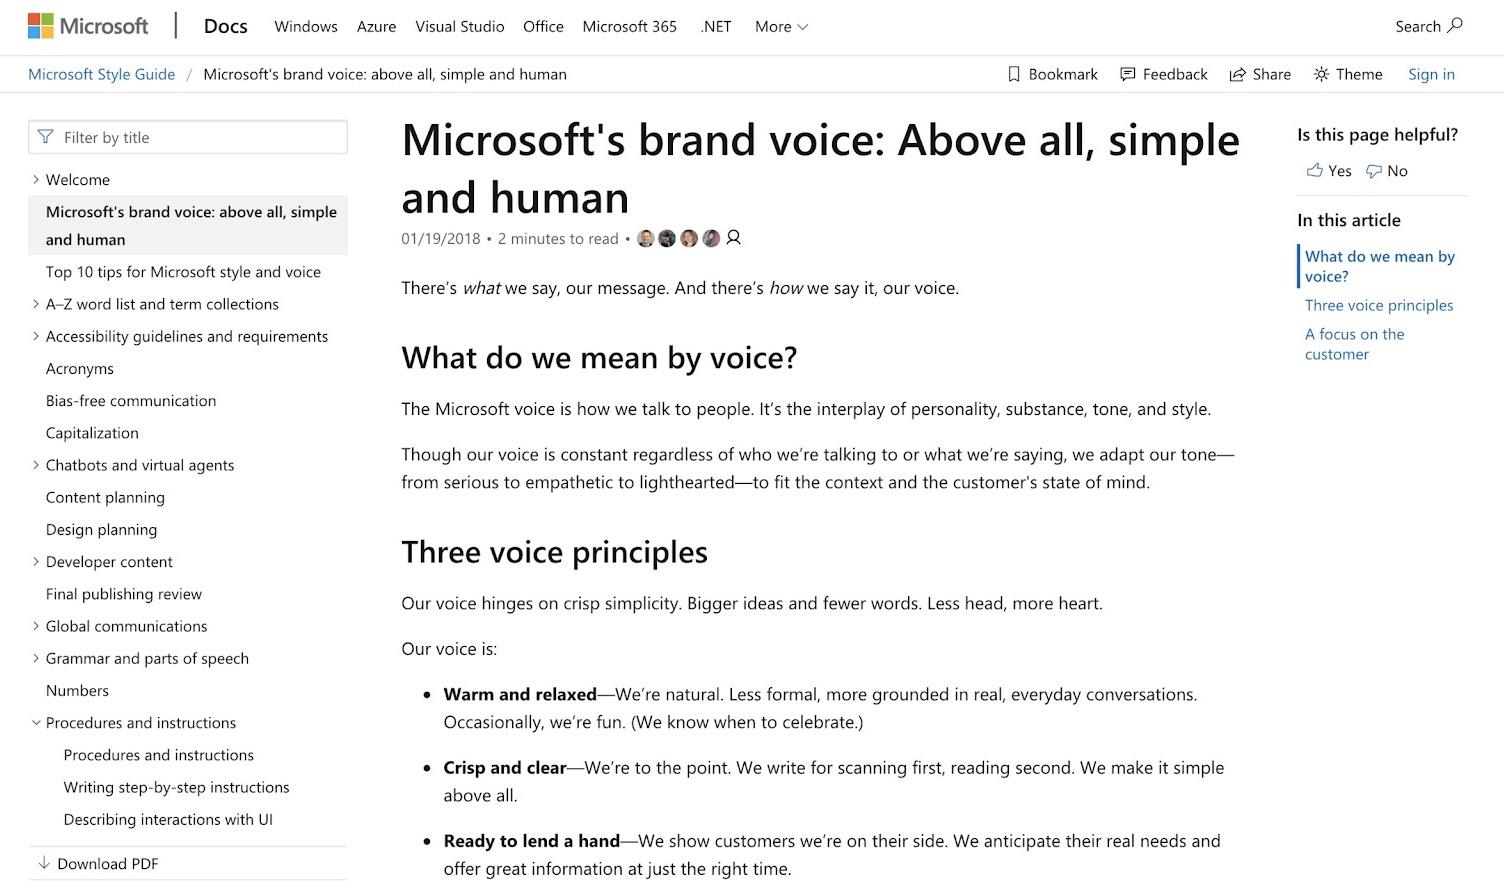 Microsoft voice knowledge base self-service